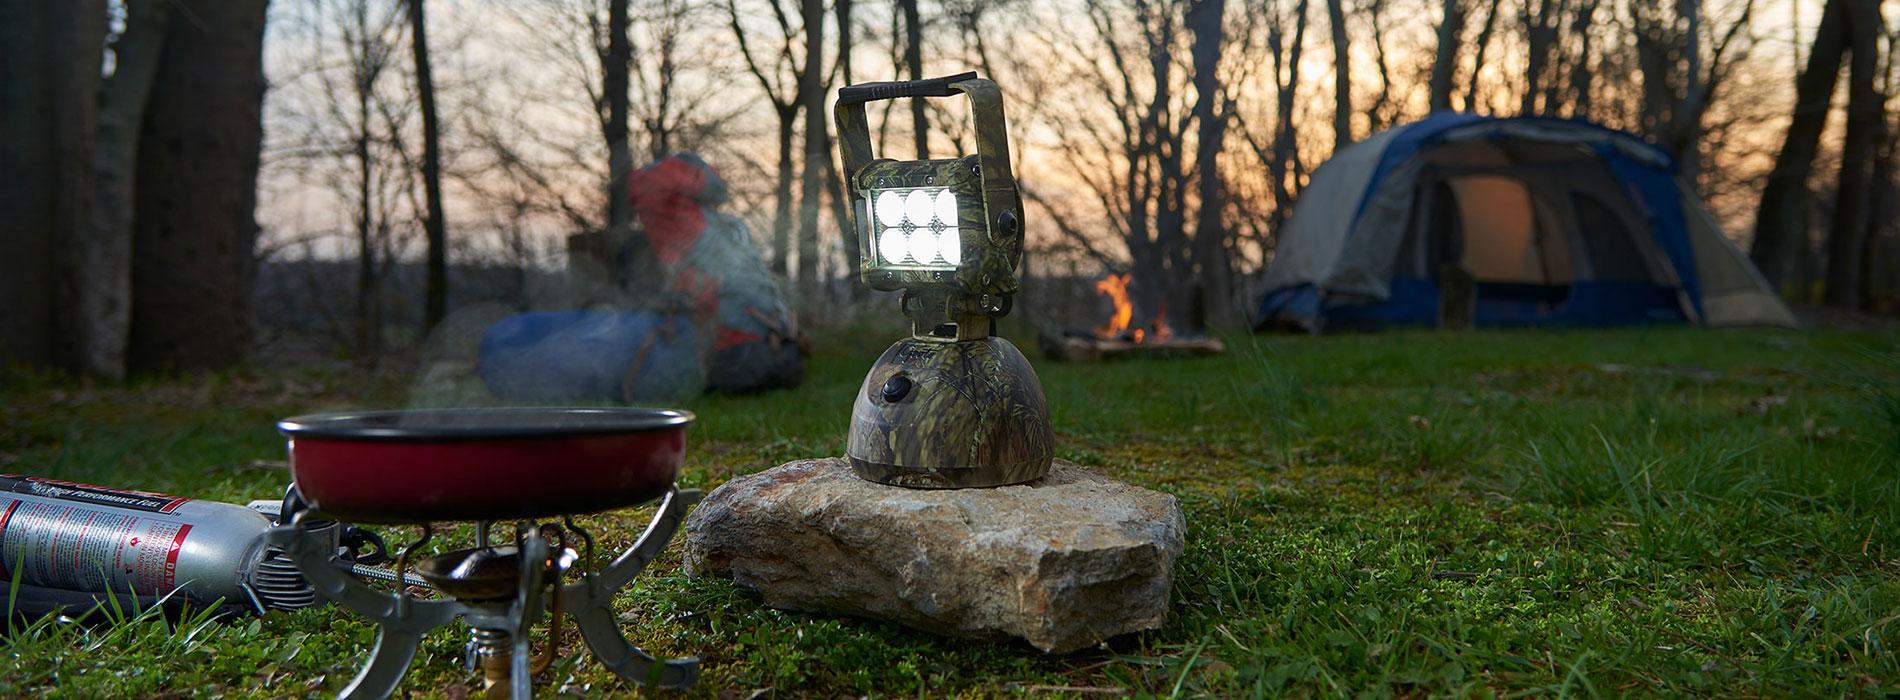 Camo LED-Campingleuchte